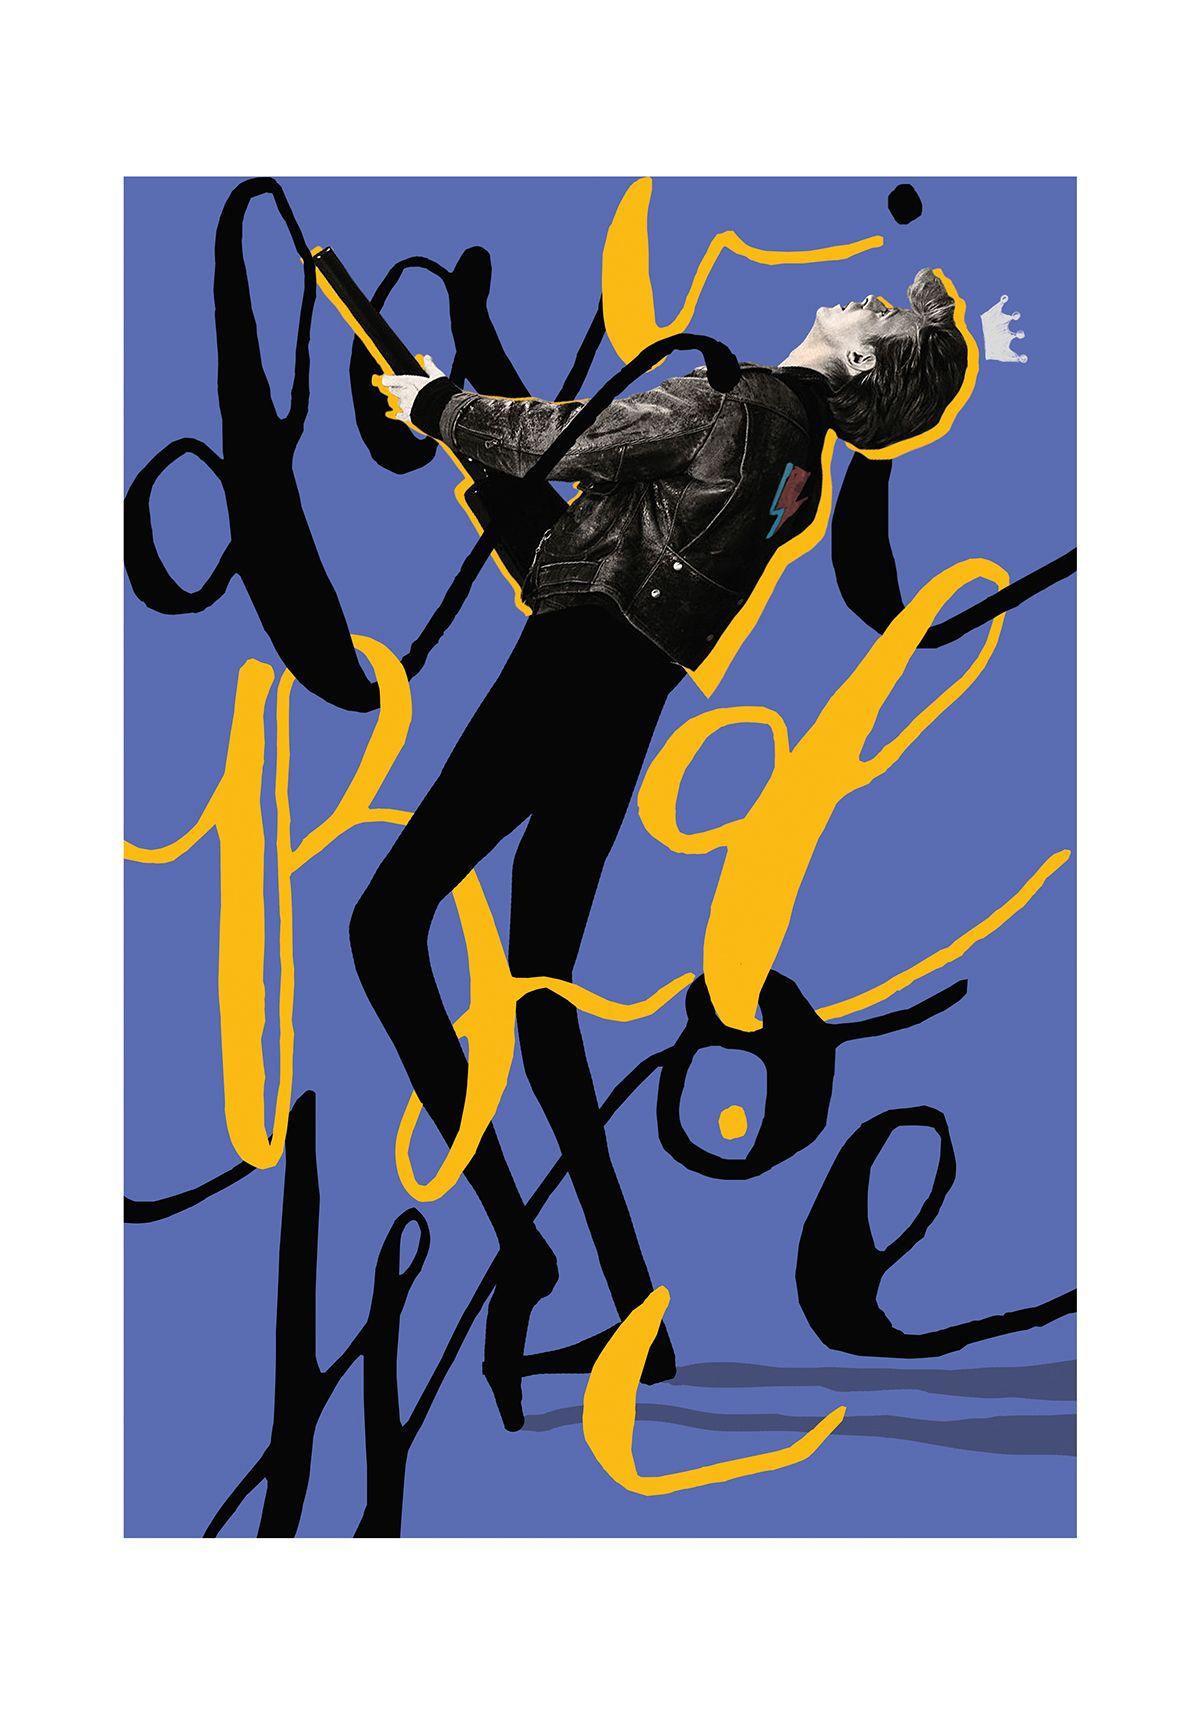 david bowie's poster with handwritten typography by Selman Hoşgör